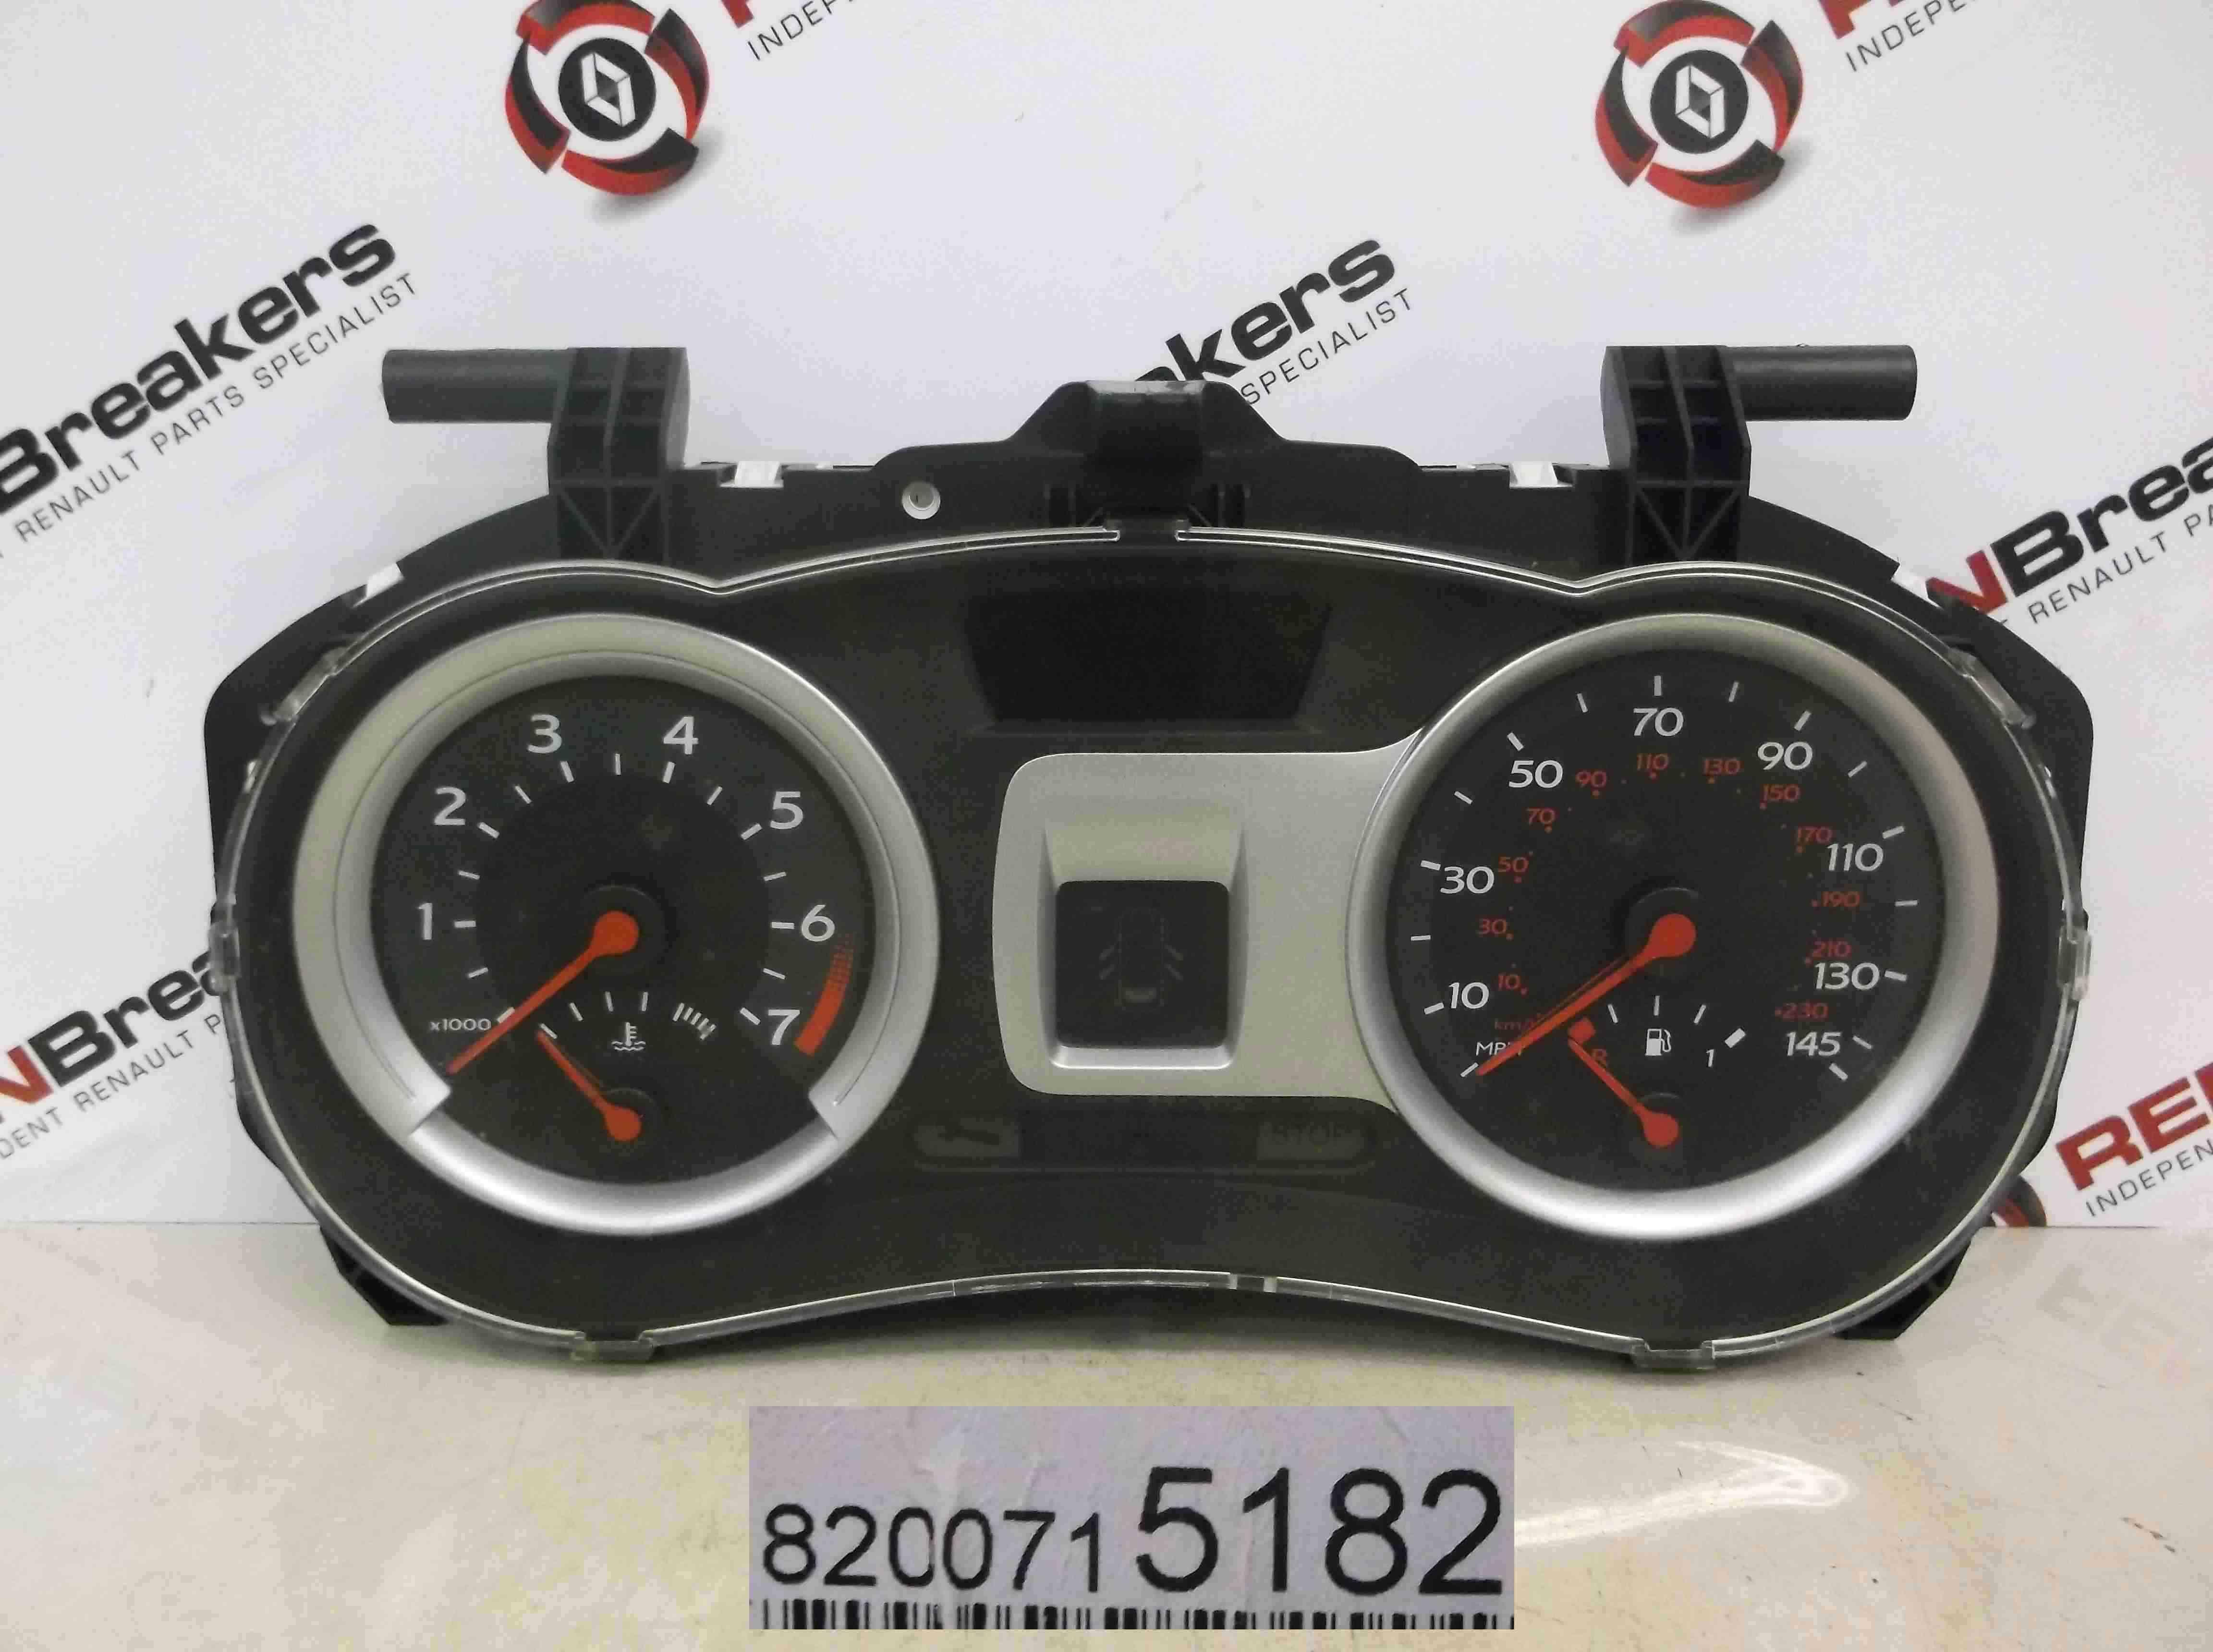 Renault Clio MK3 2005-2012 Instrument Dials Clocks Gauges 8200715182